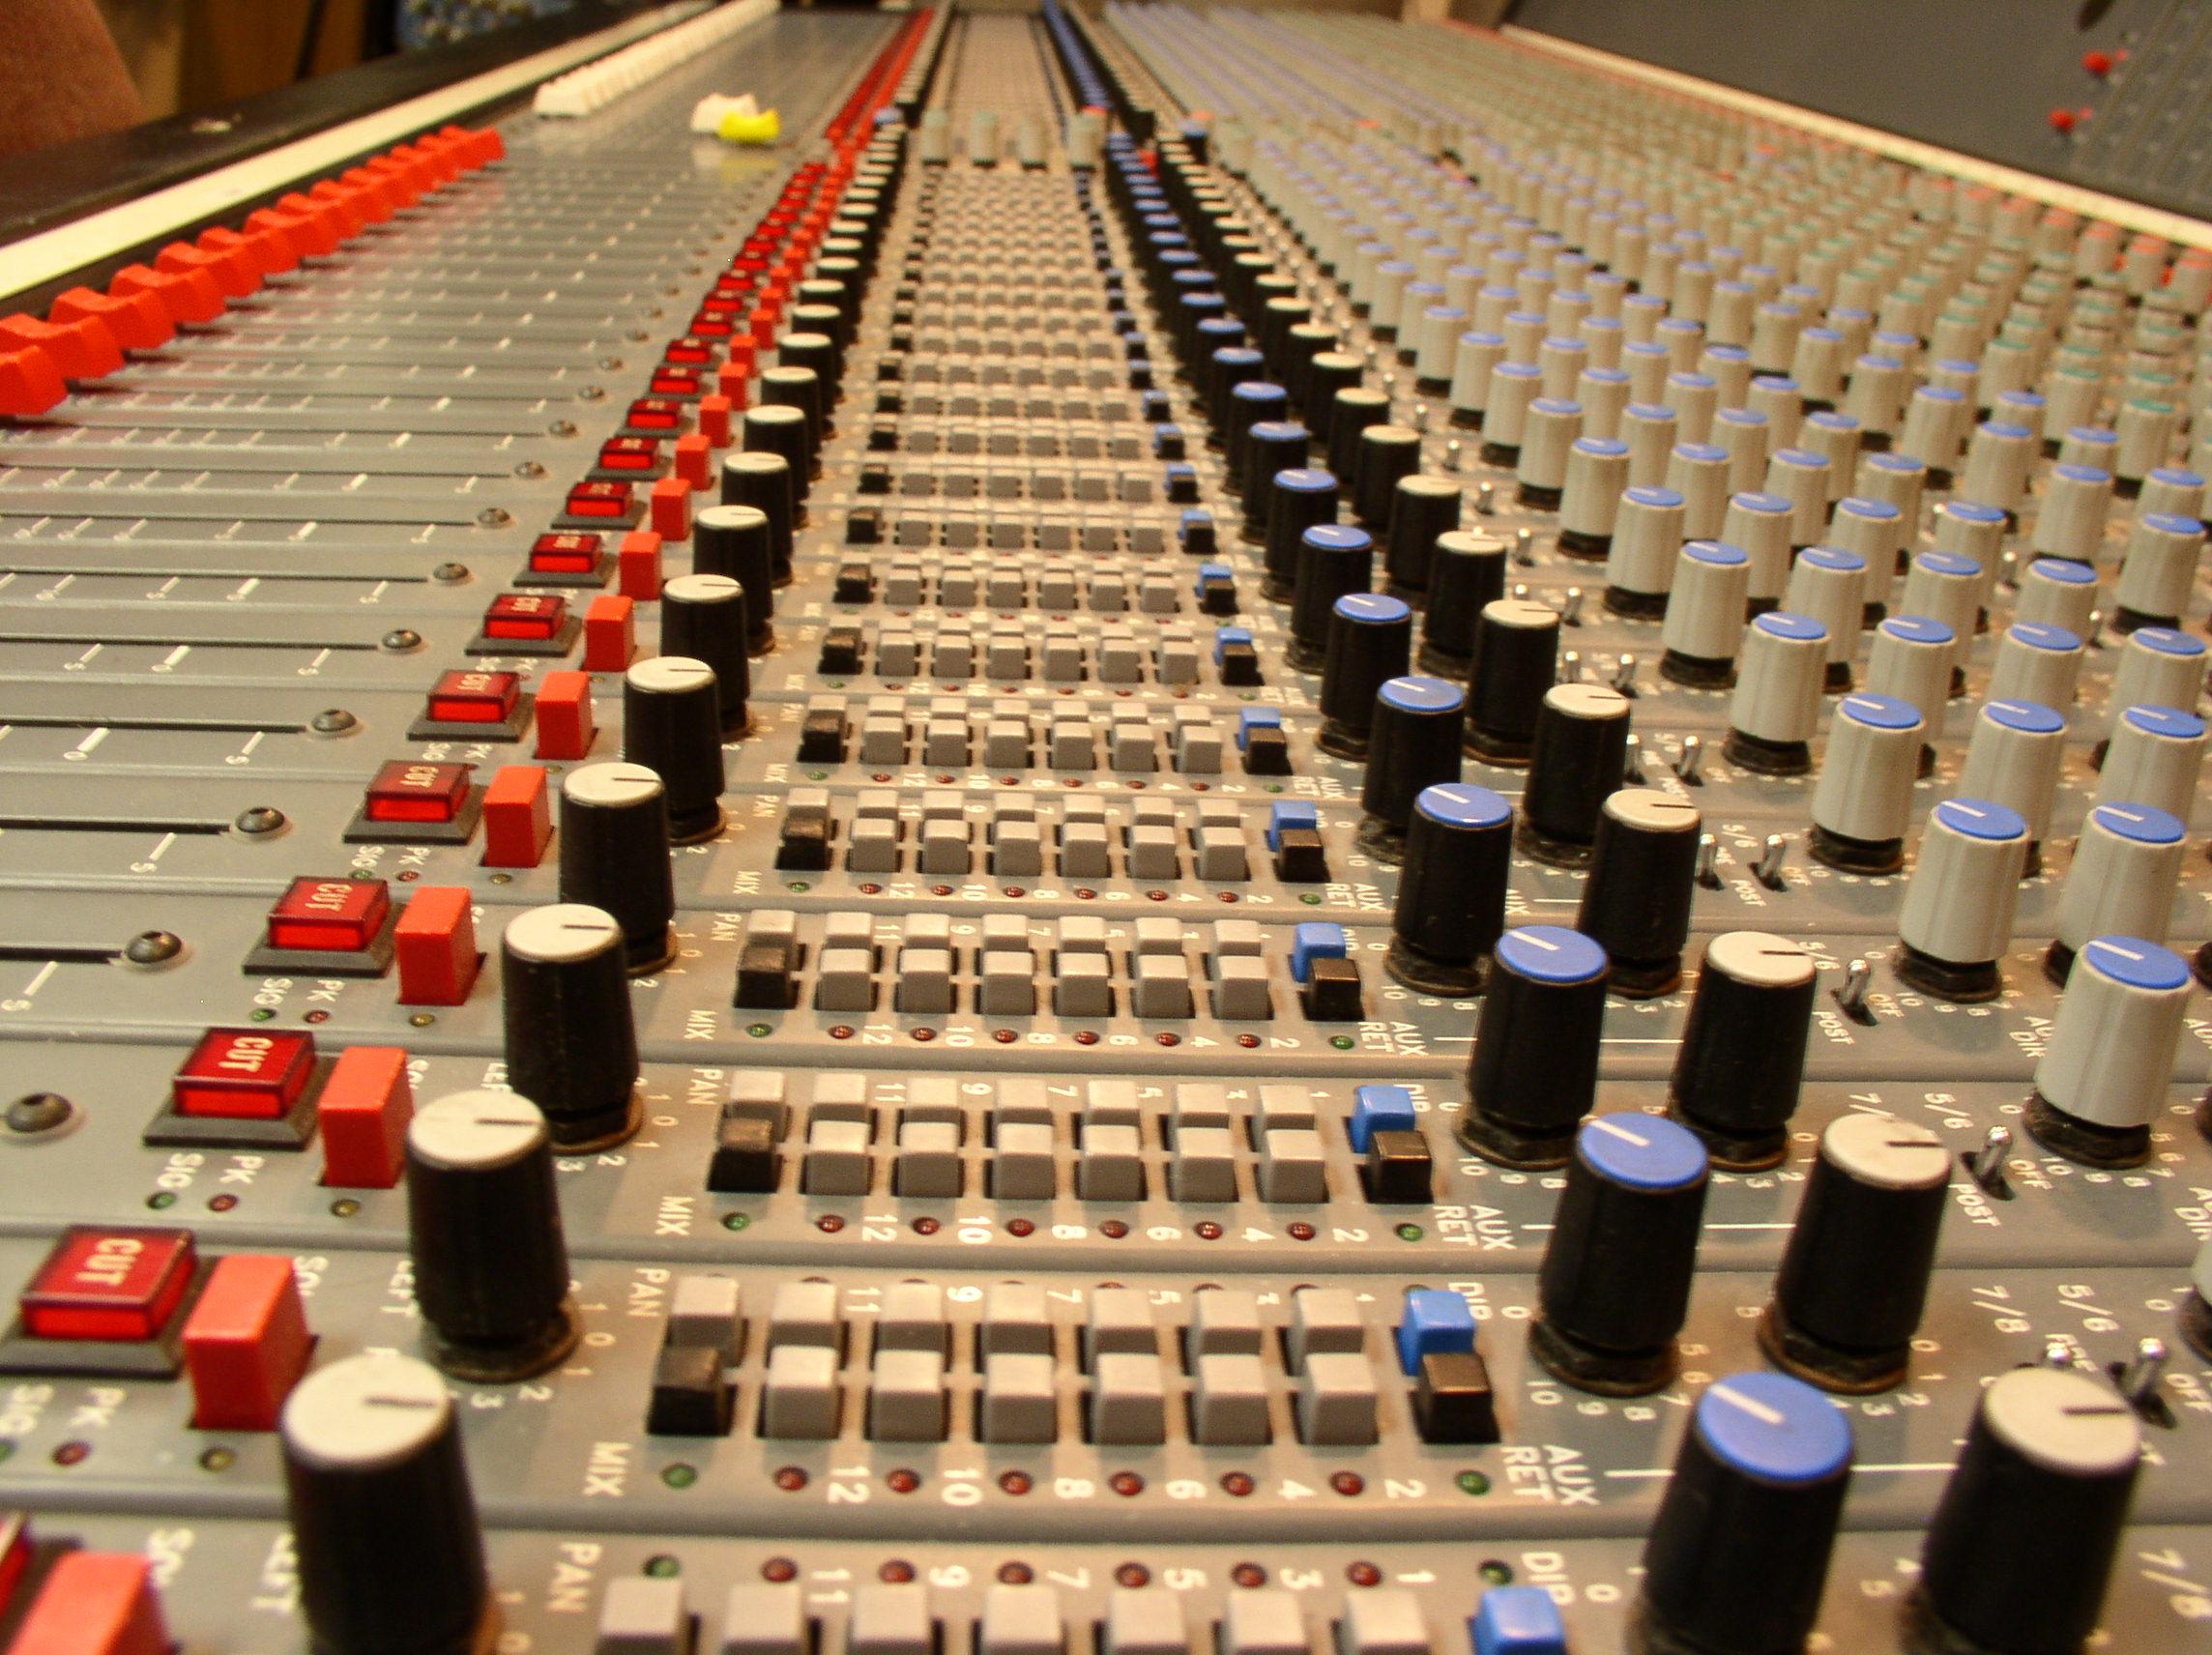 Lynda.com - Audio Mixing Bootcamp price